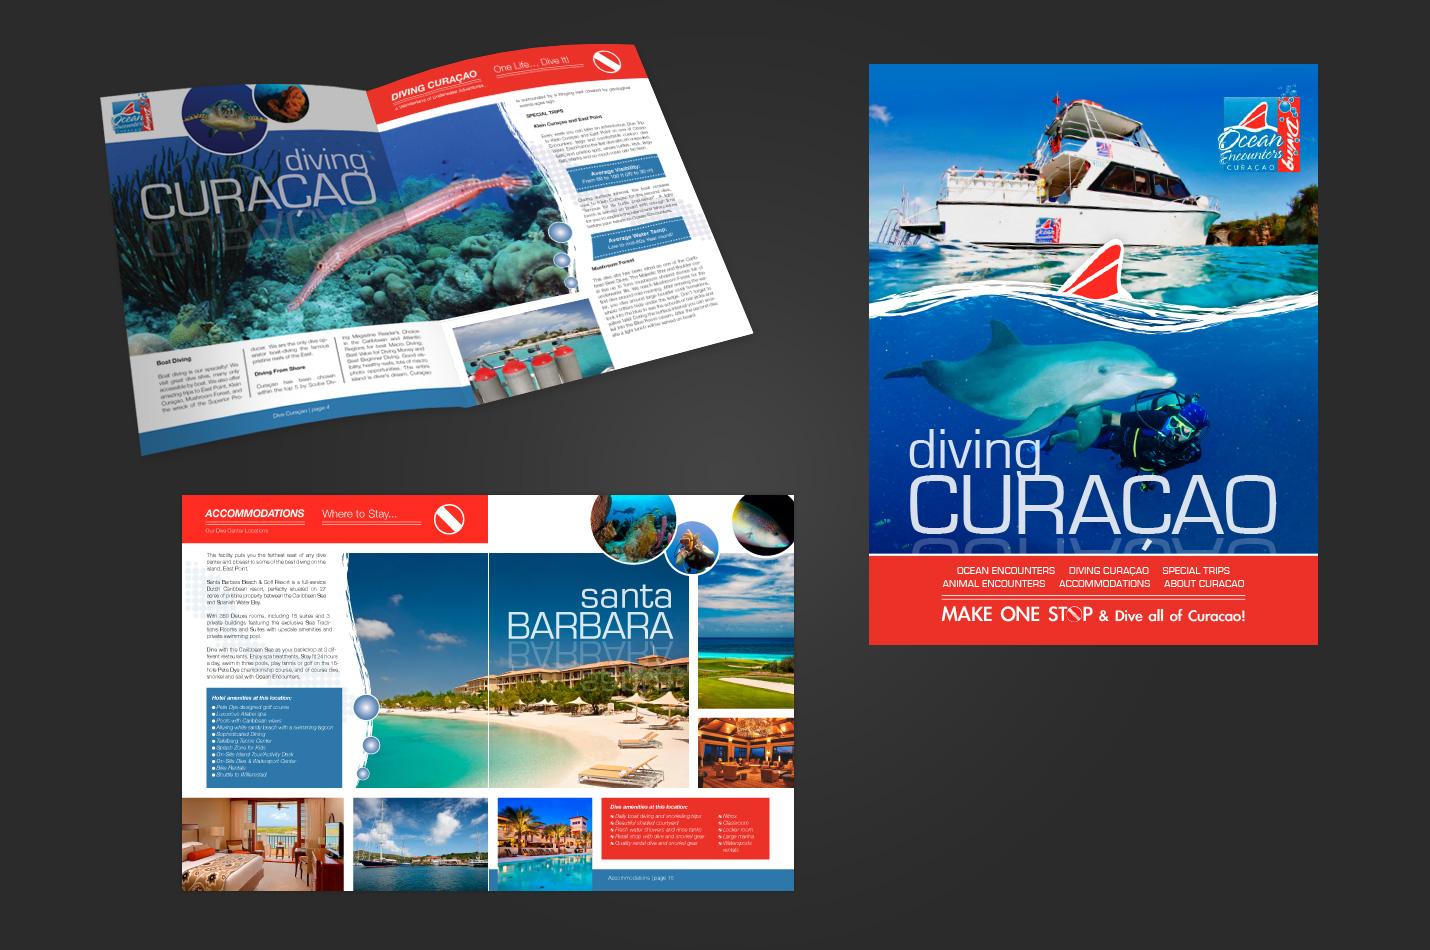 Ocean Encounters - graphic design by k-Dushi.com